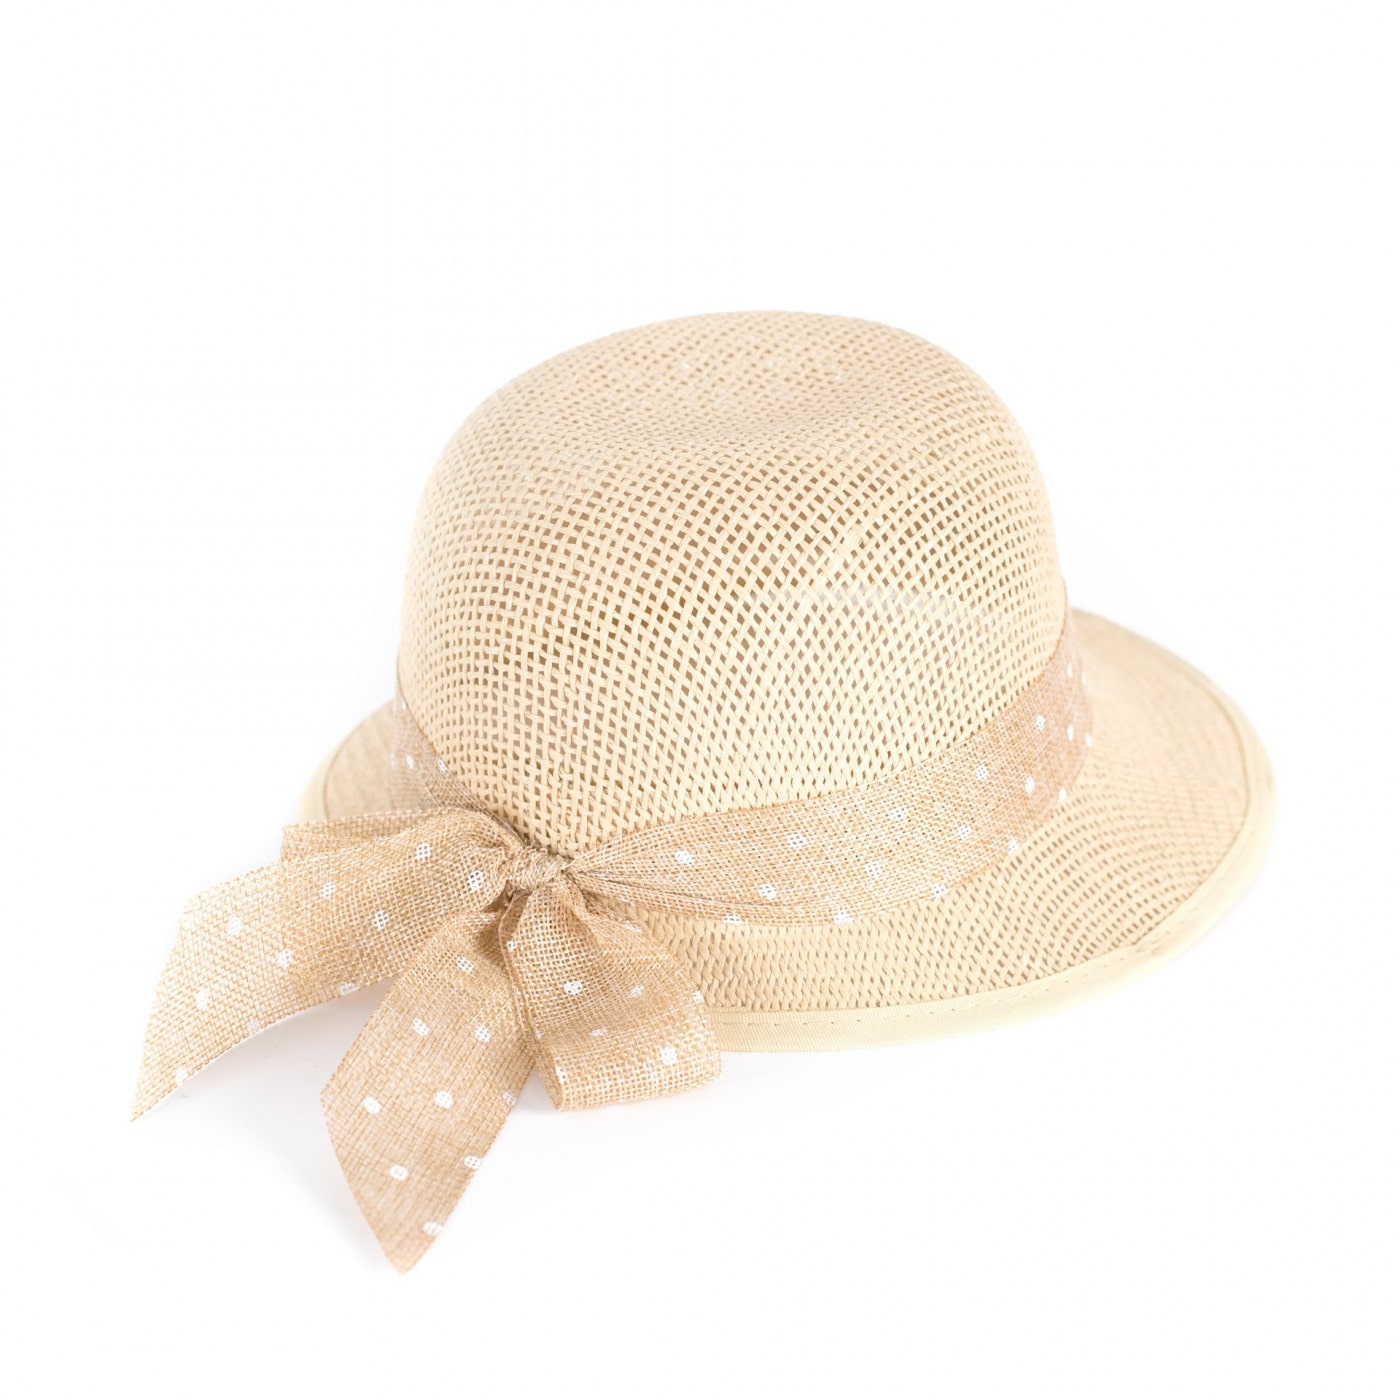 Art Of Polo Woman's Hat cz19141